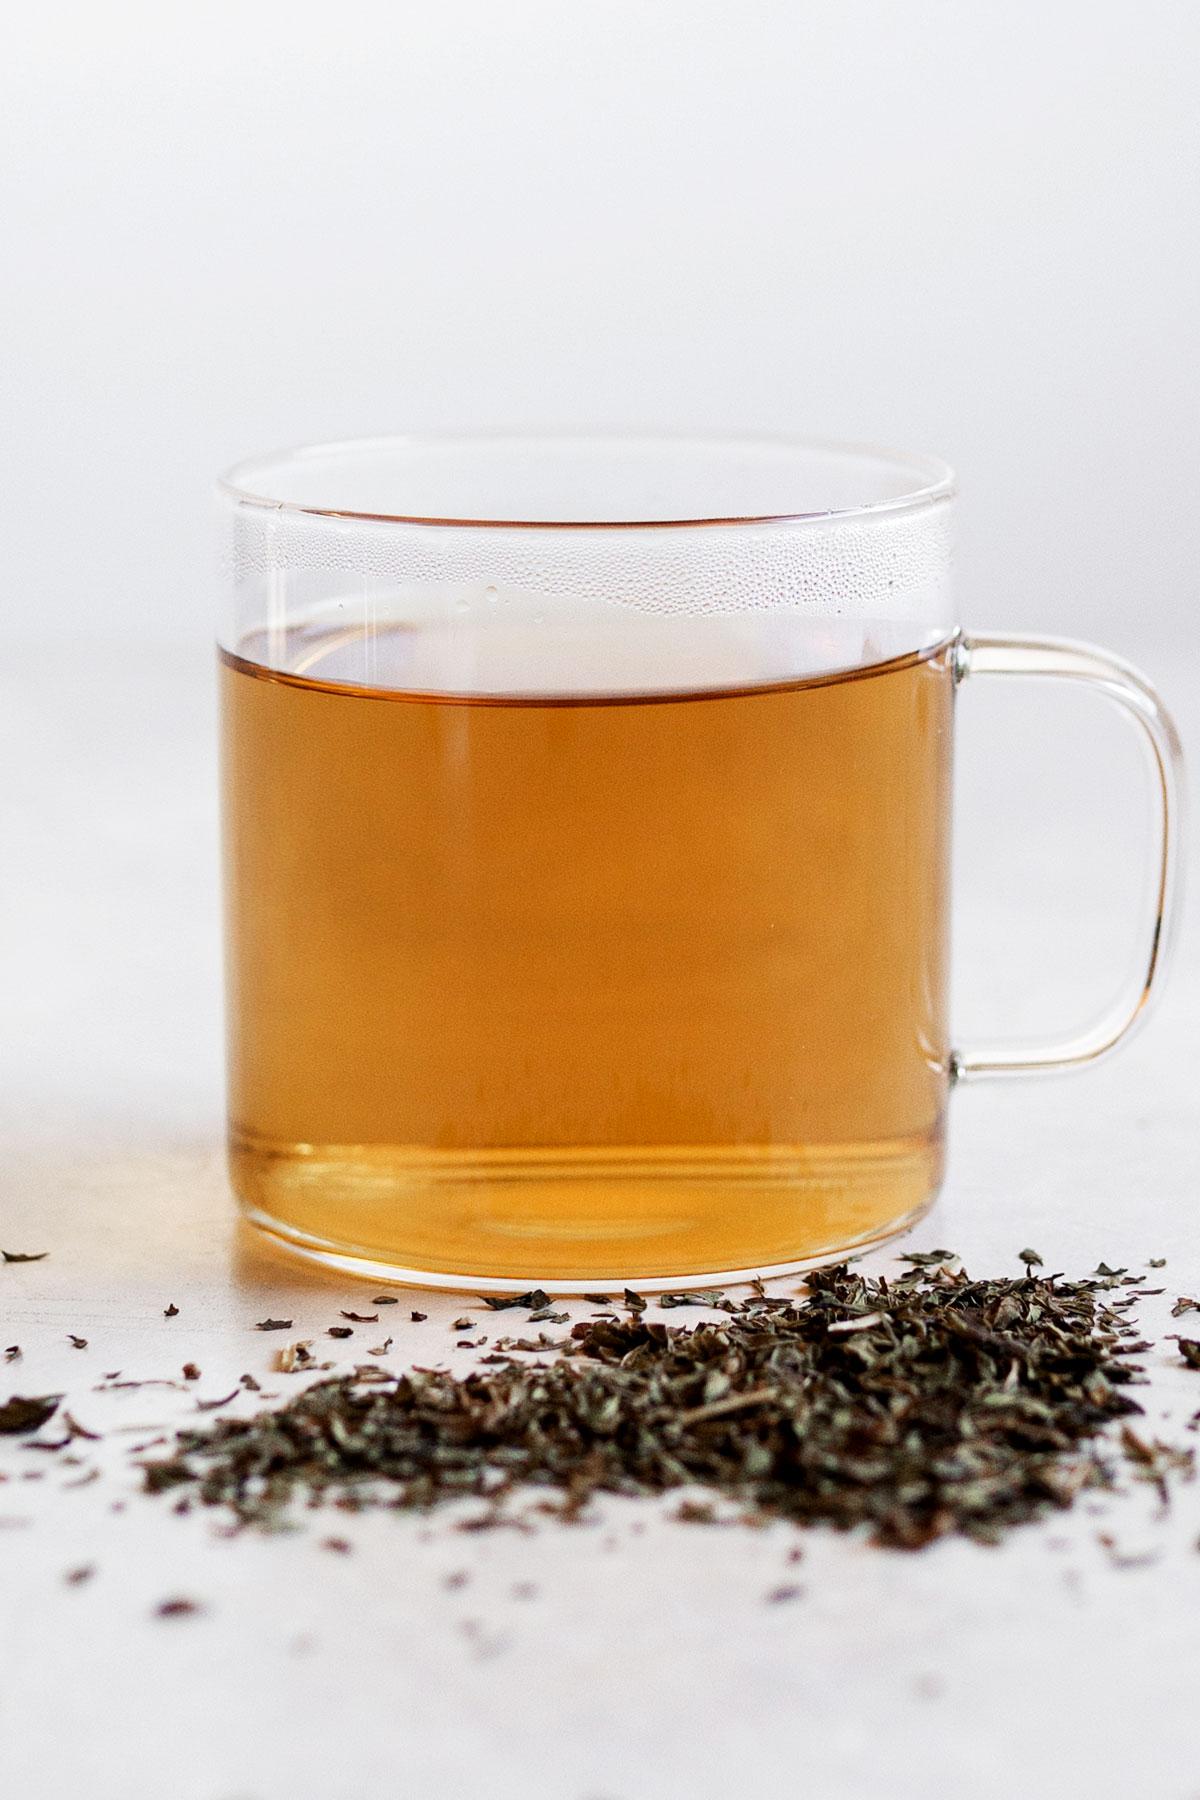 Hot peppermint tea in a glass mug.